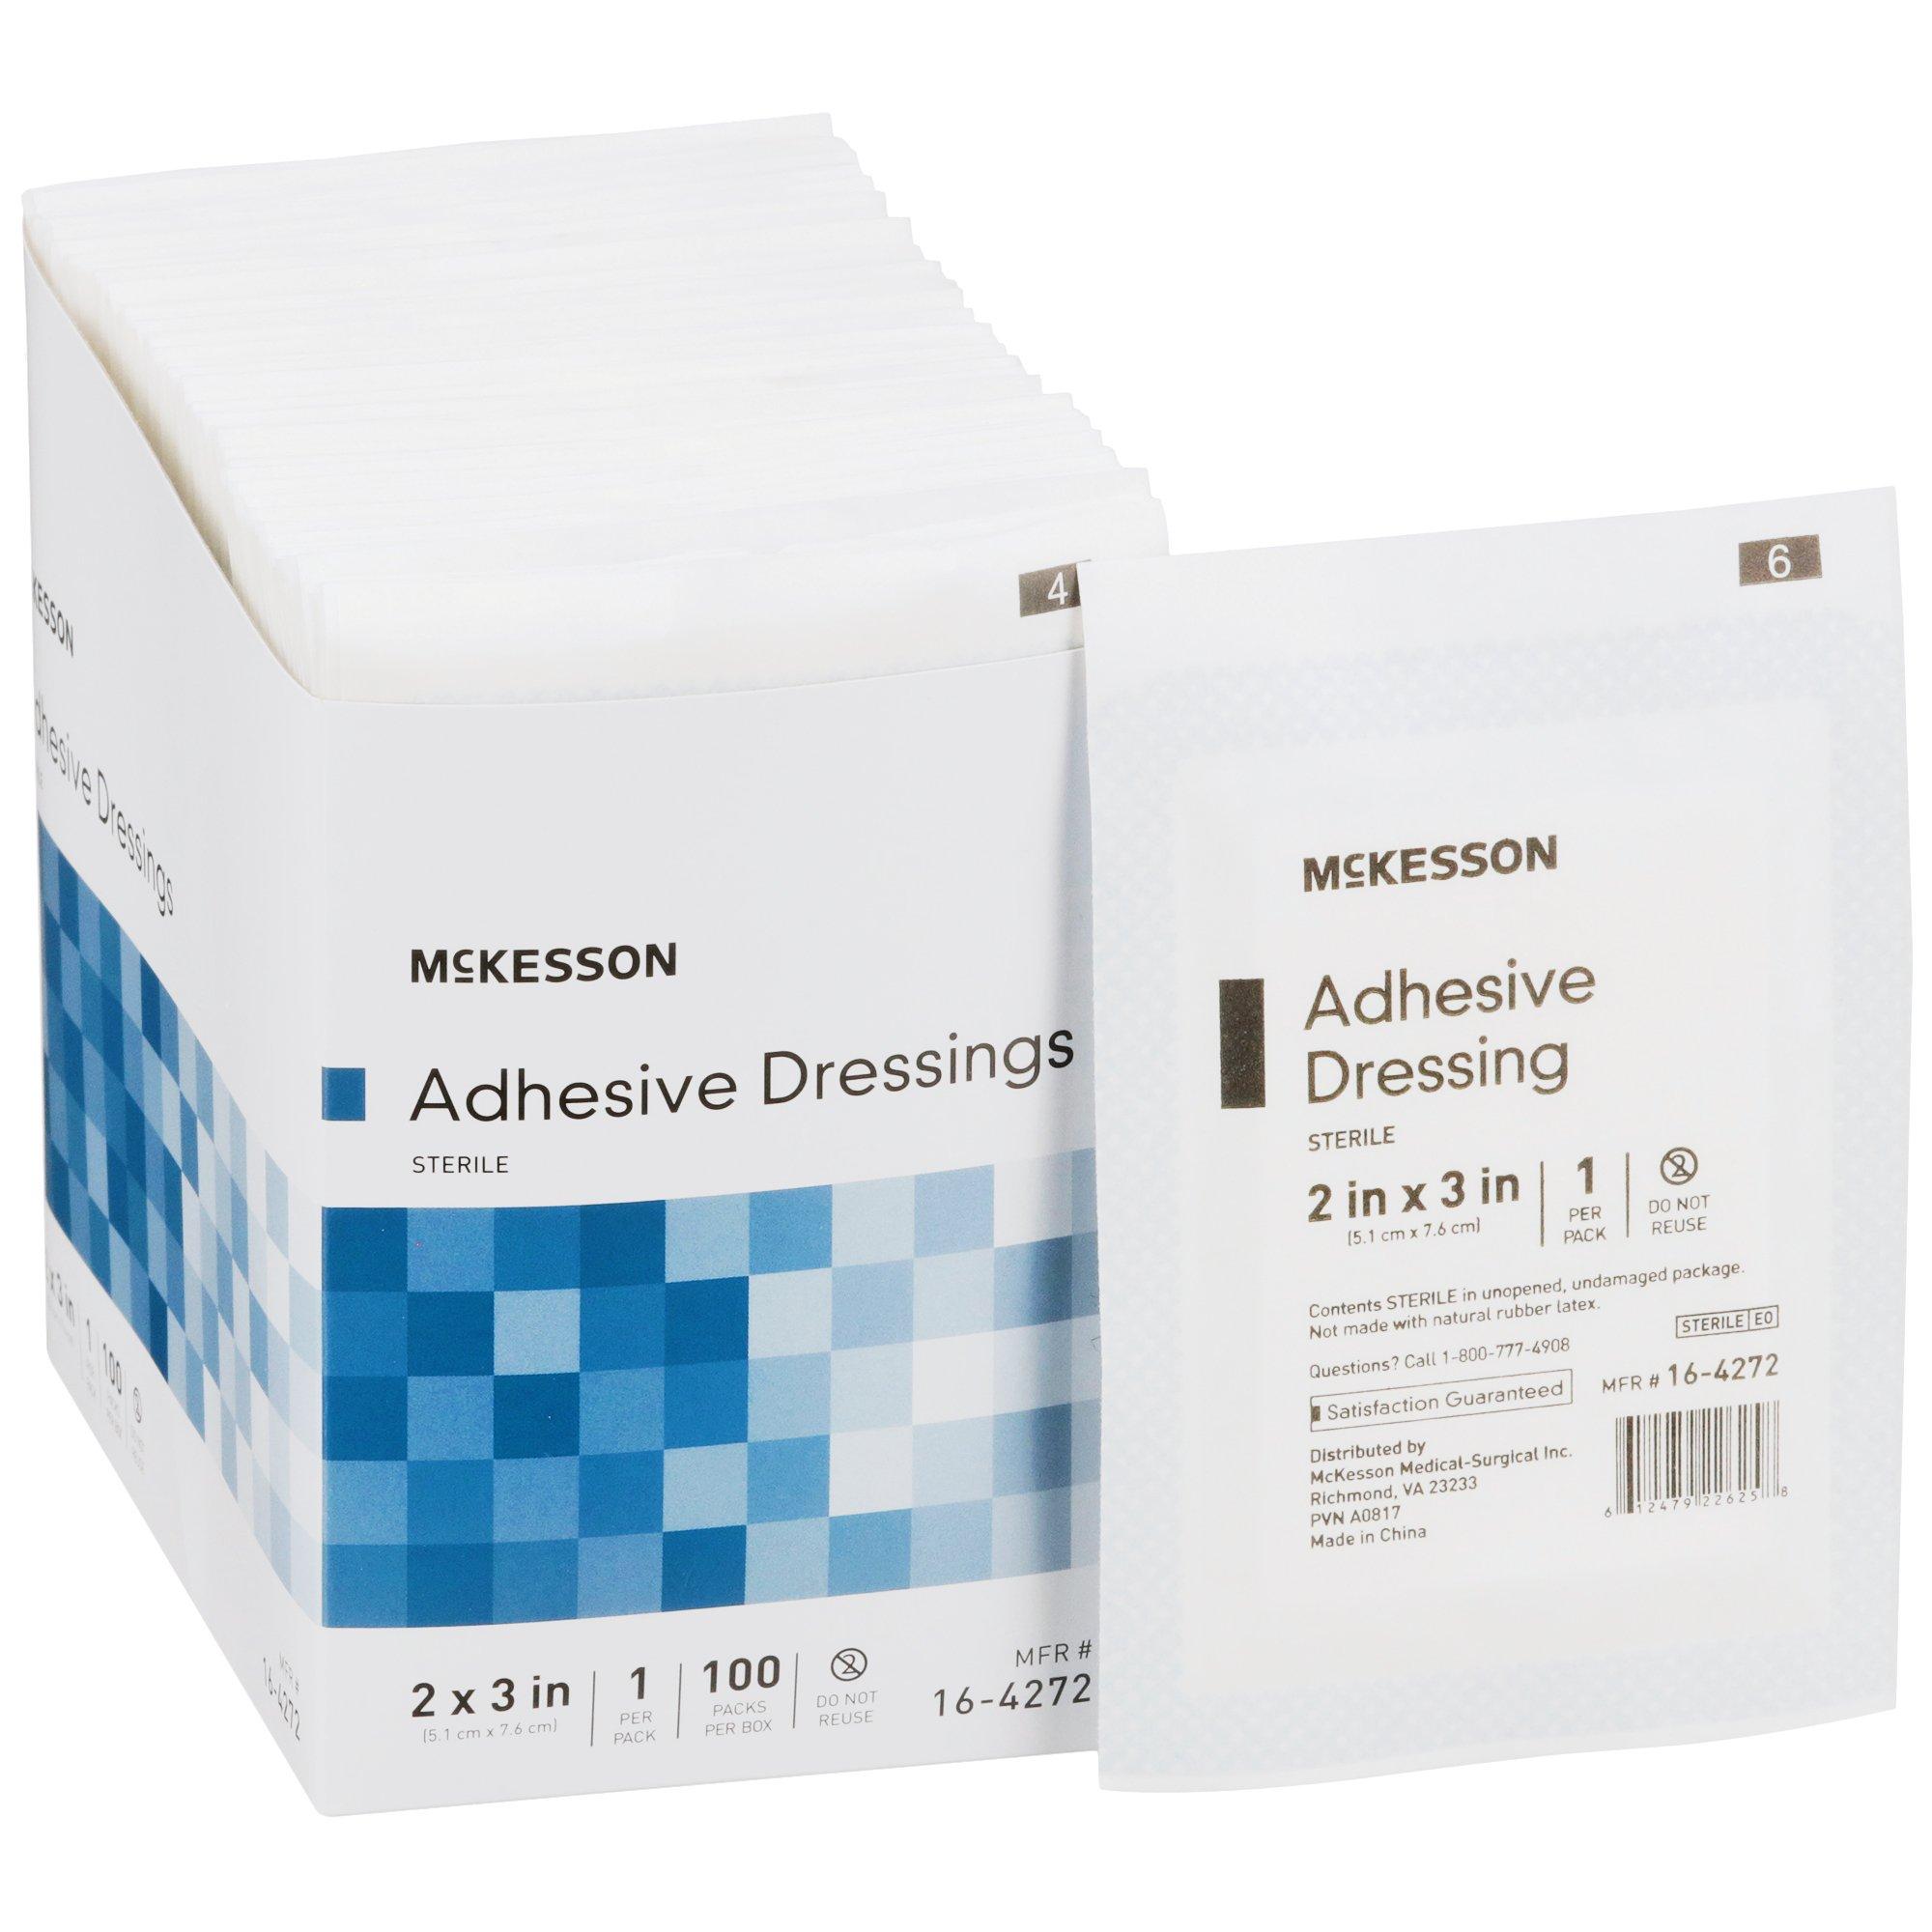 "McKesson Adhesive Dressing, 2 X 3"", 16-4272, Box of 100"